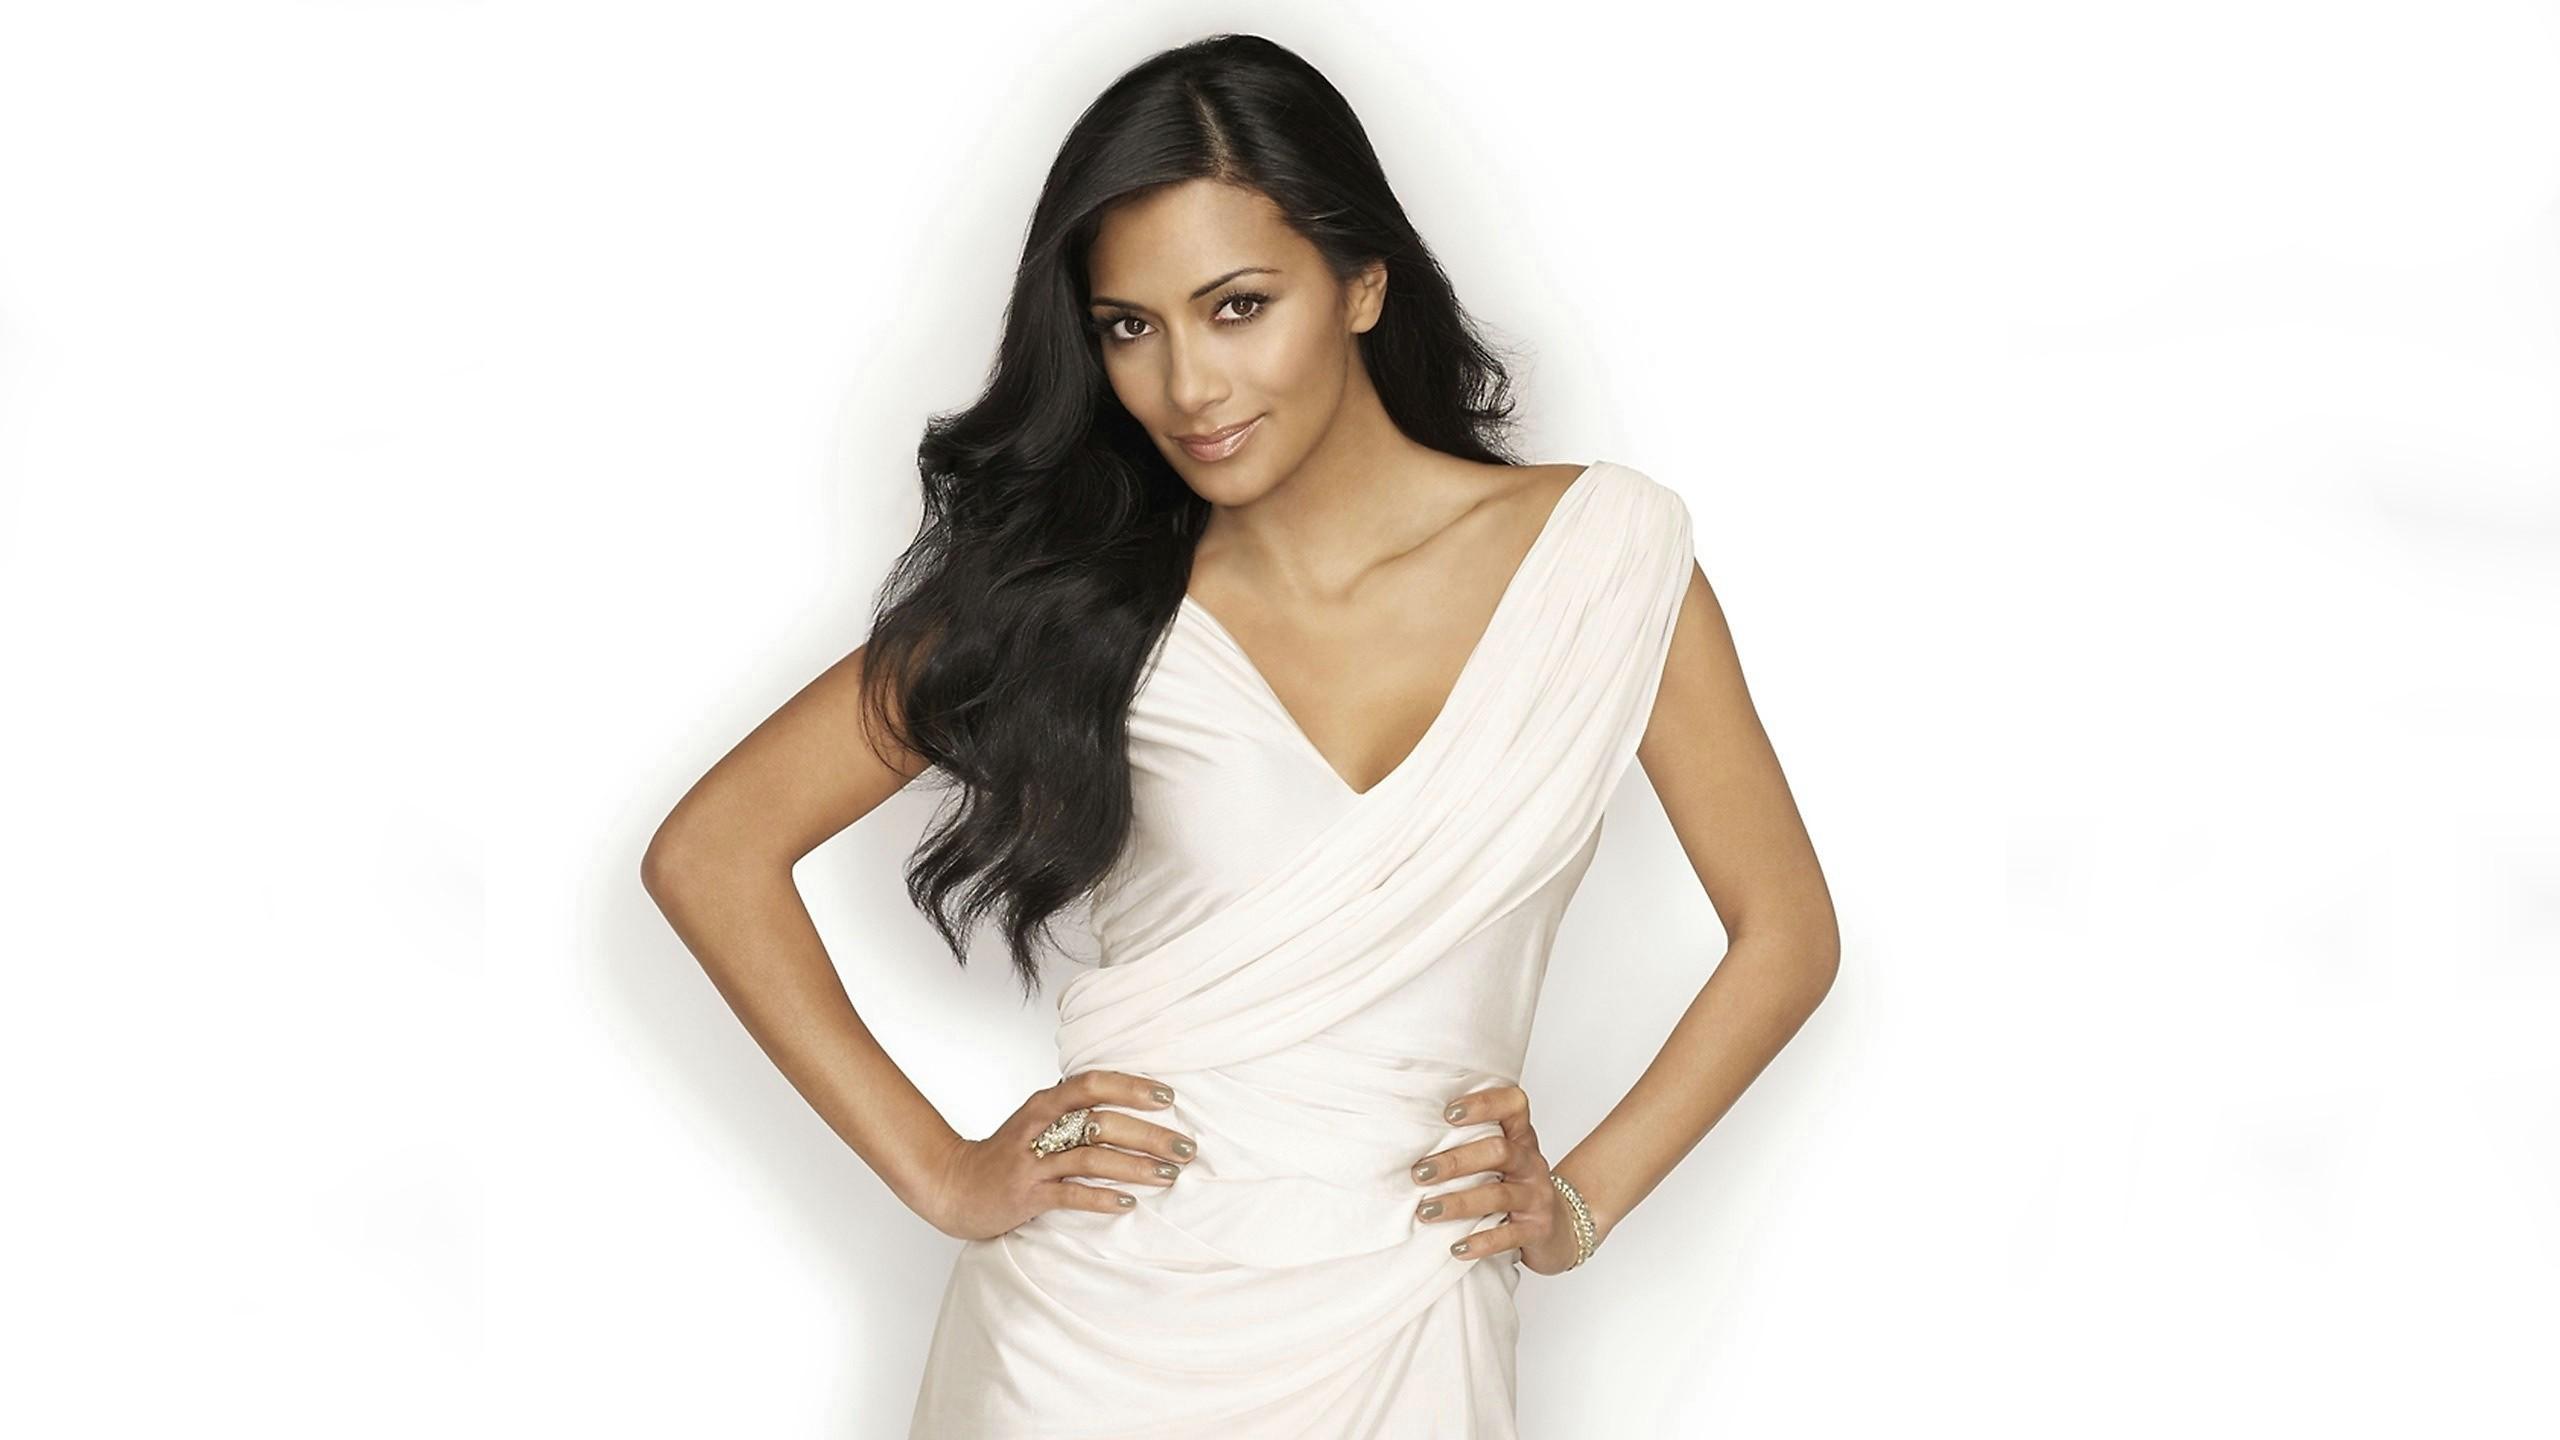 Hintergrundbilder : Frau, Modell-, lange Haare, Kleid ...